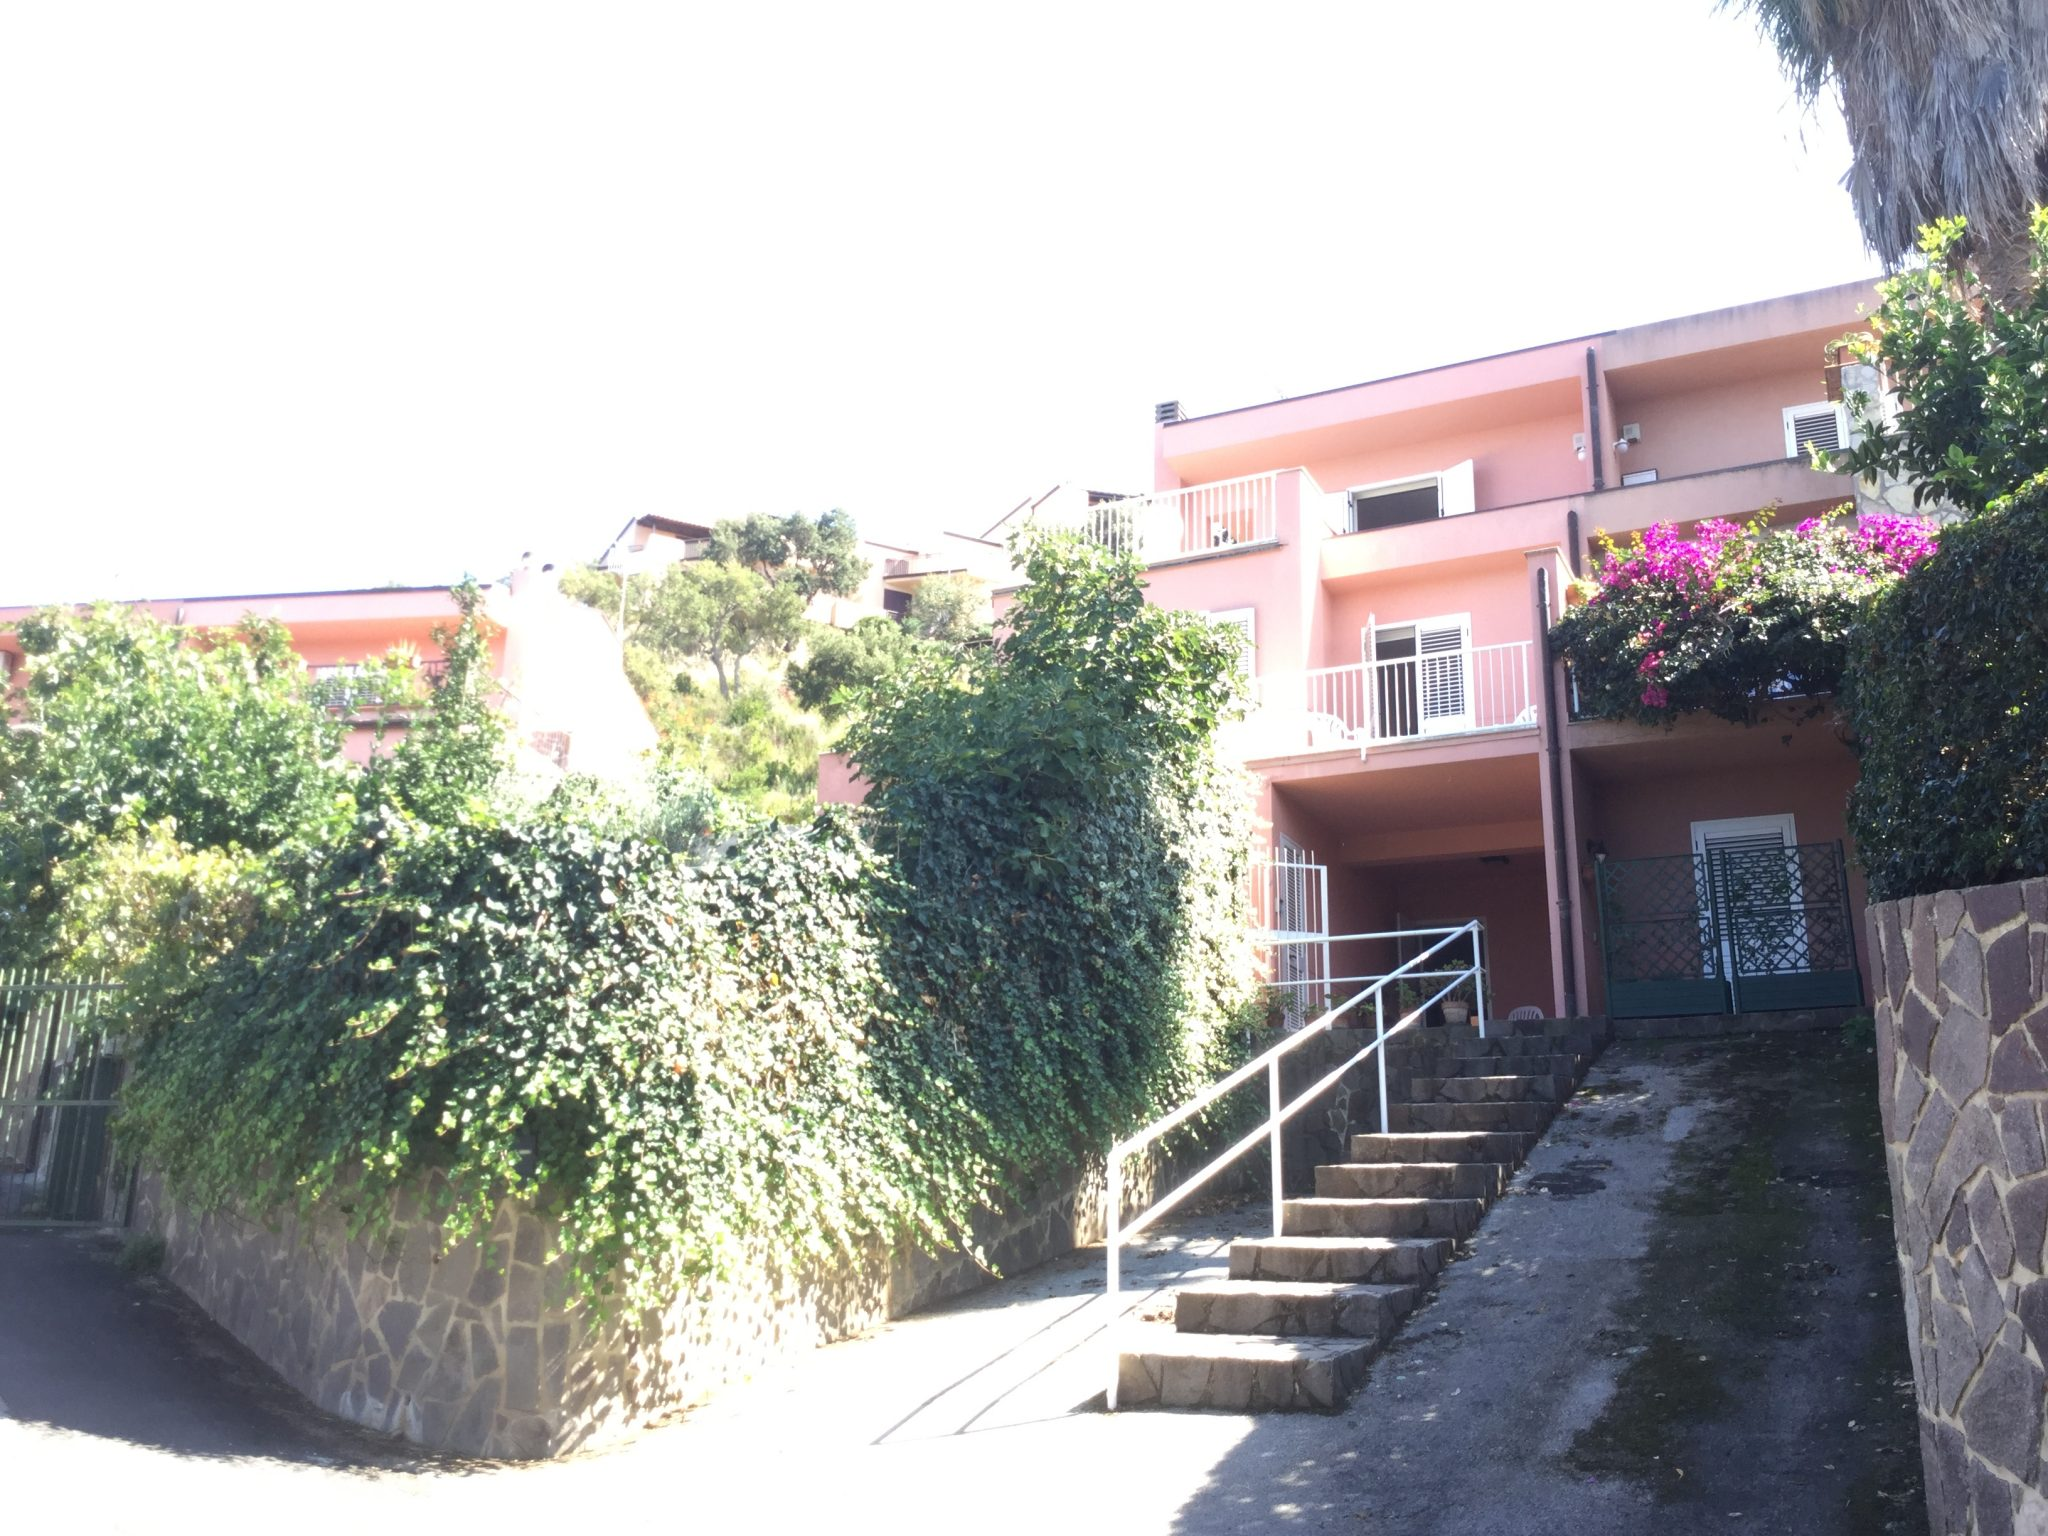 074  - Villa panoramica , Via dei Casali, Cefalù.